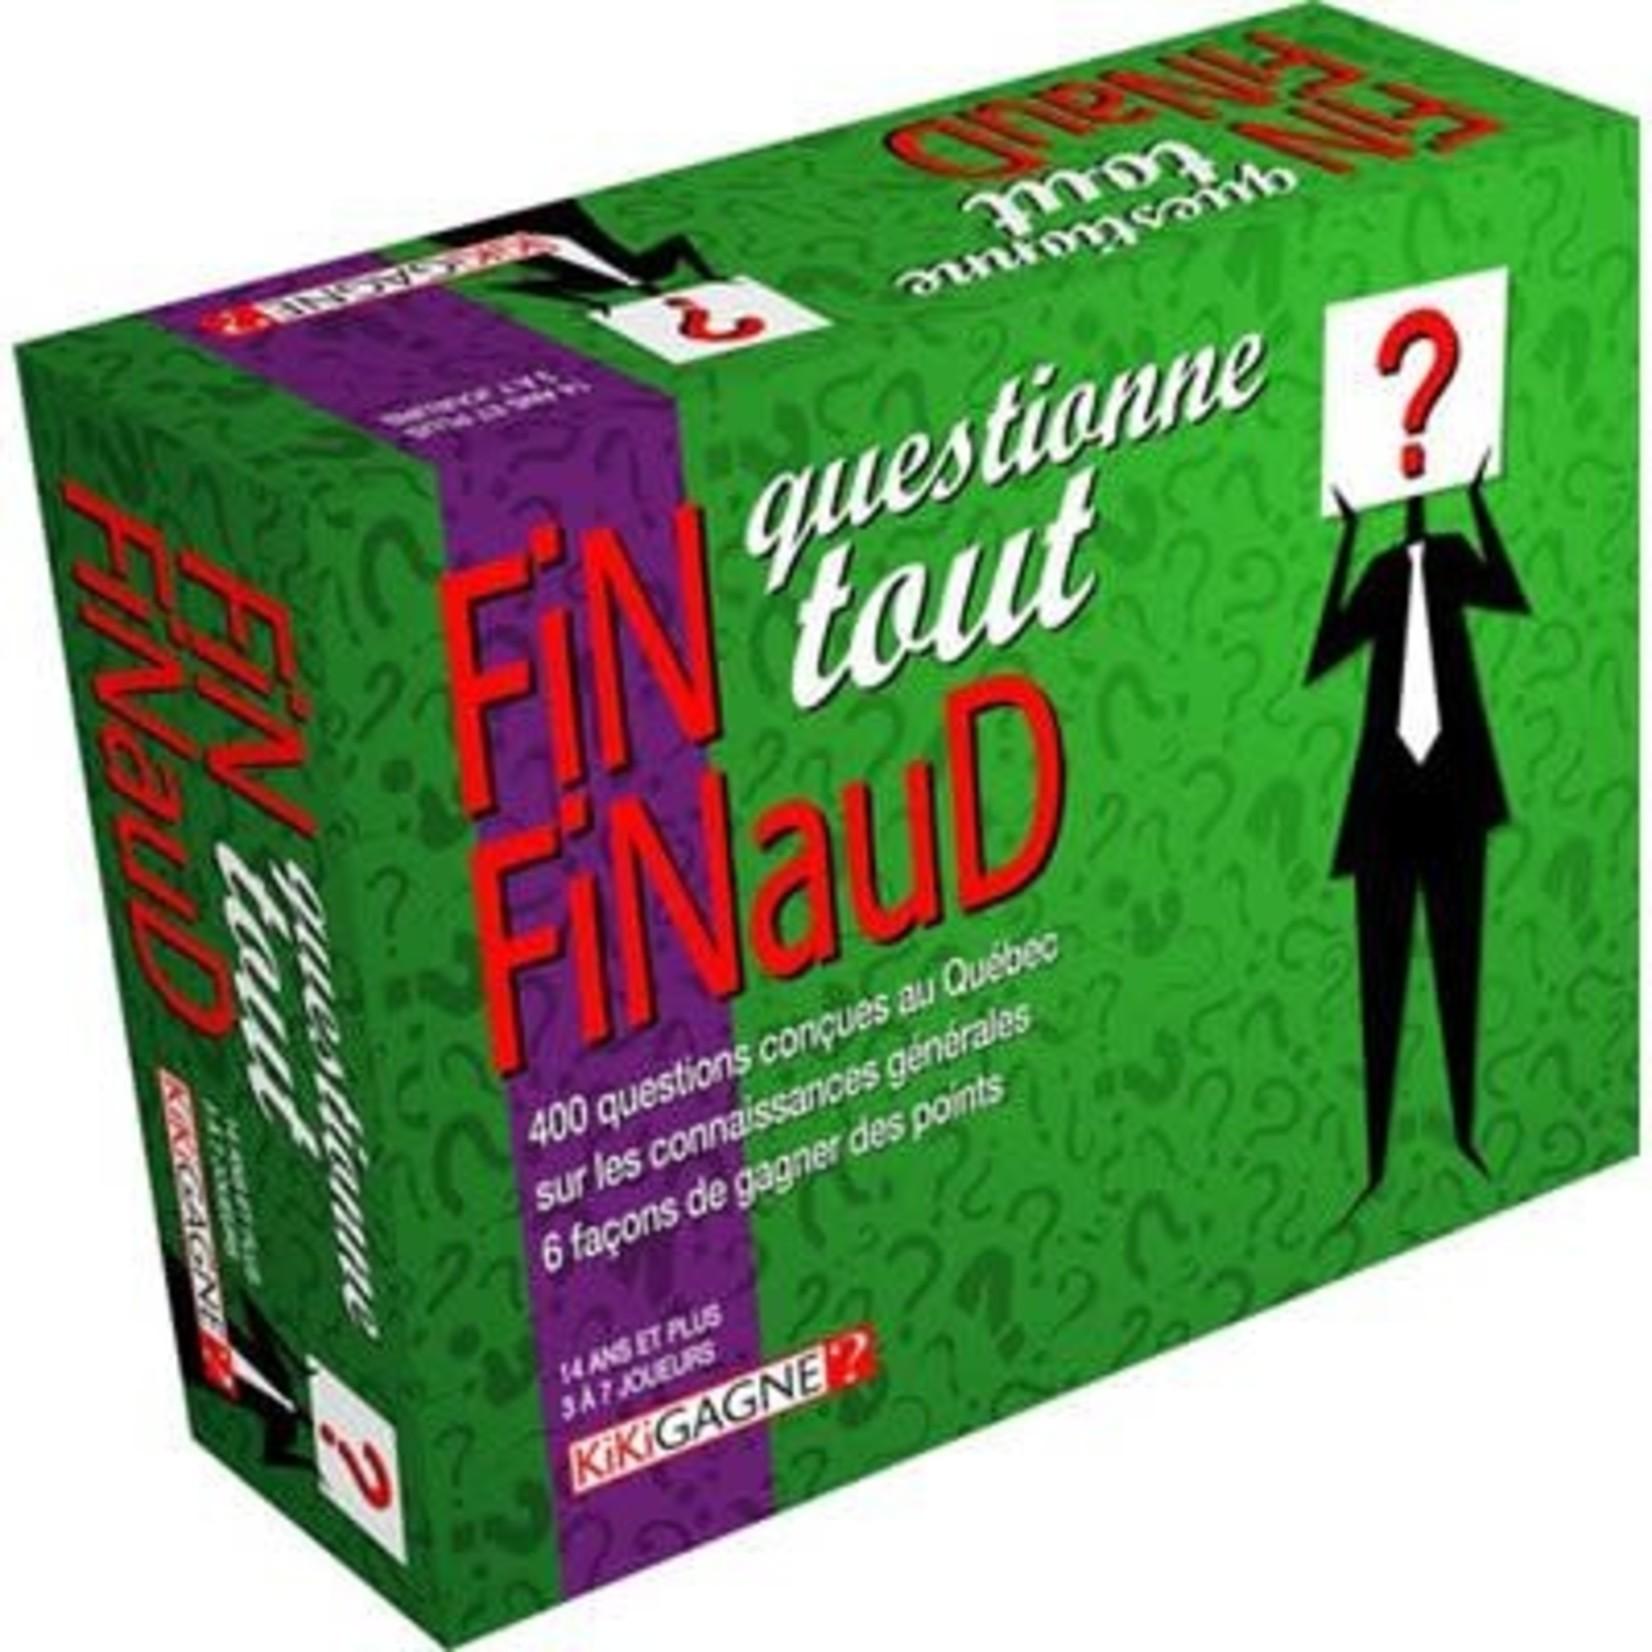 KikiGagne Fin finaud questionne tout (French)